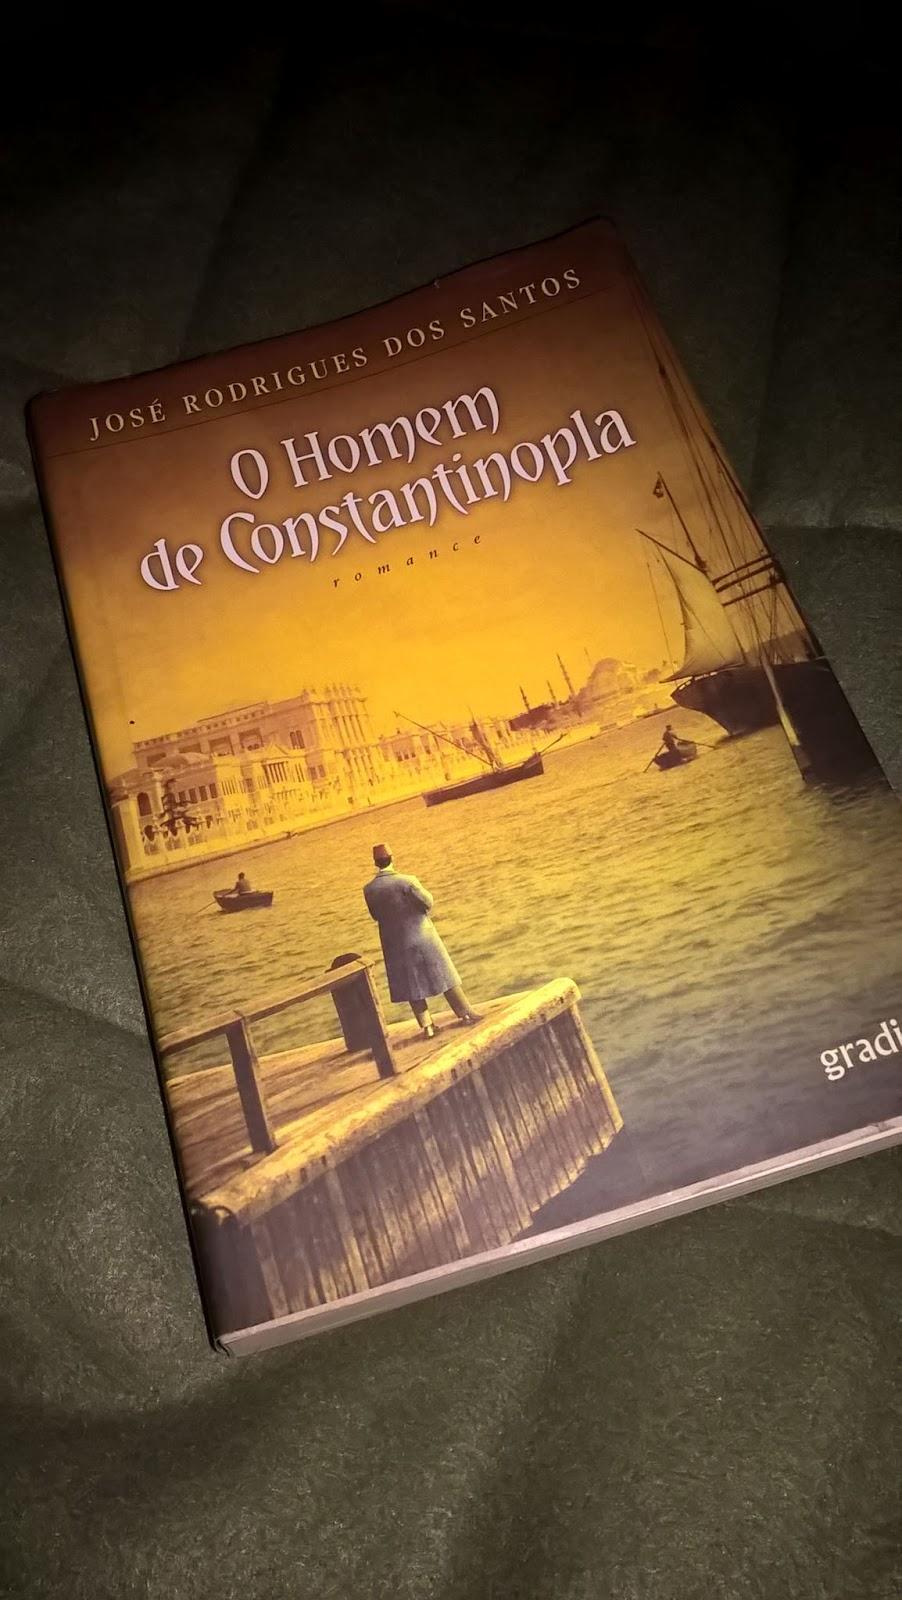 Lido: O Homem de Constantinopla, de José Rodrigues dos Santos